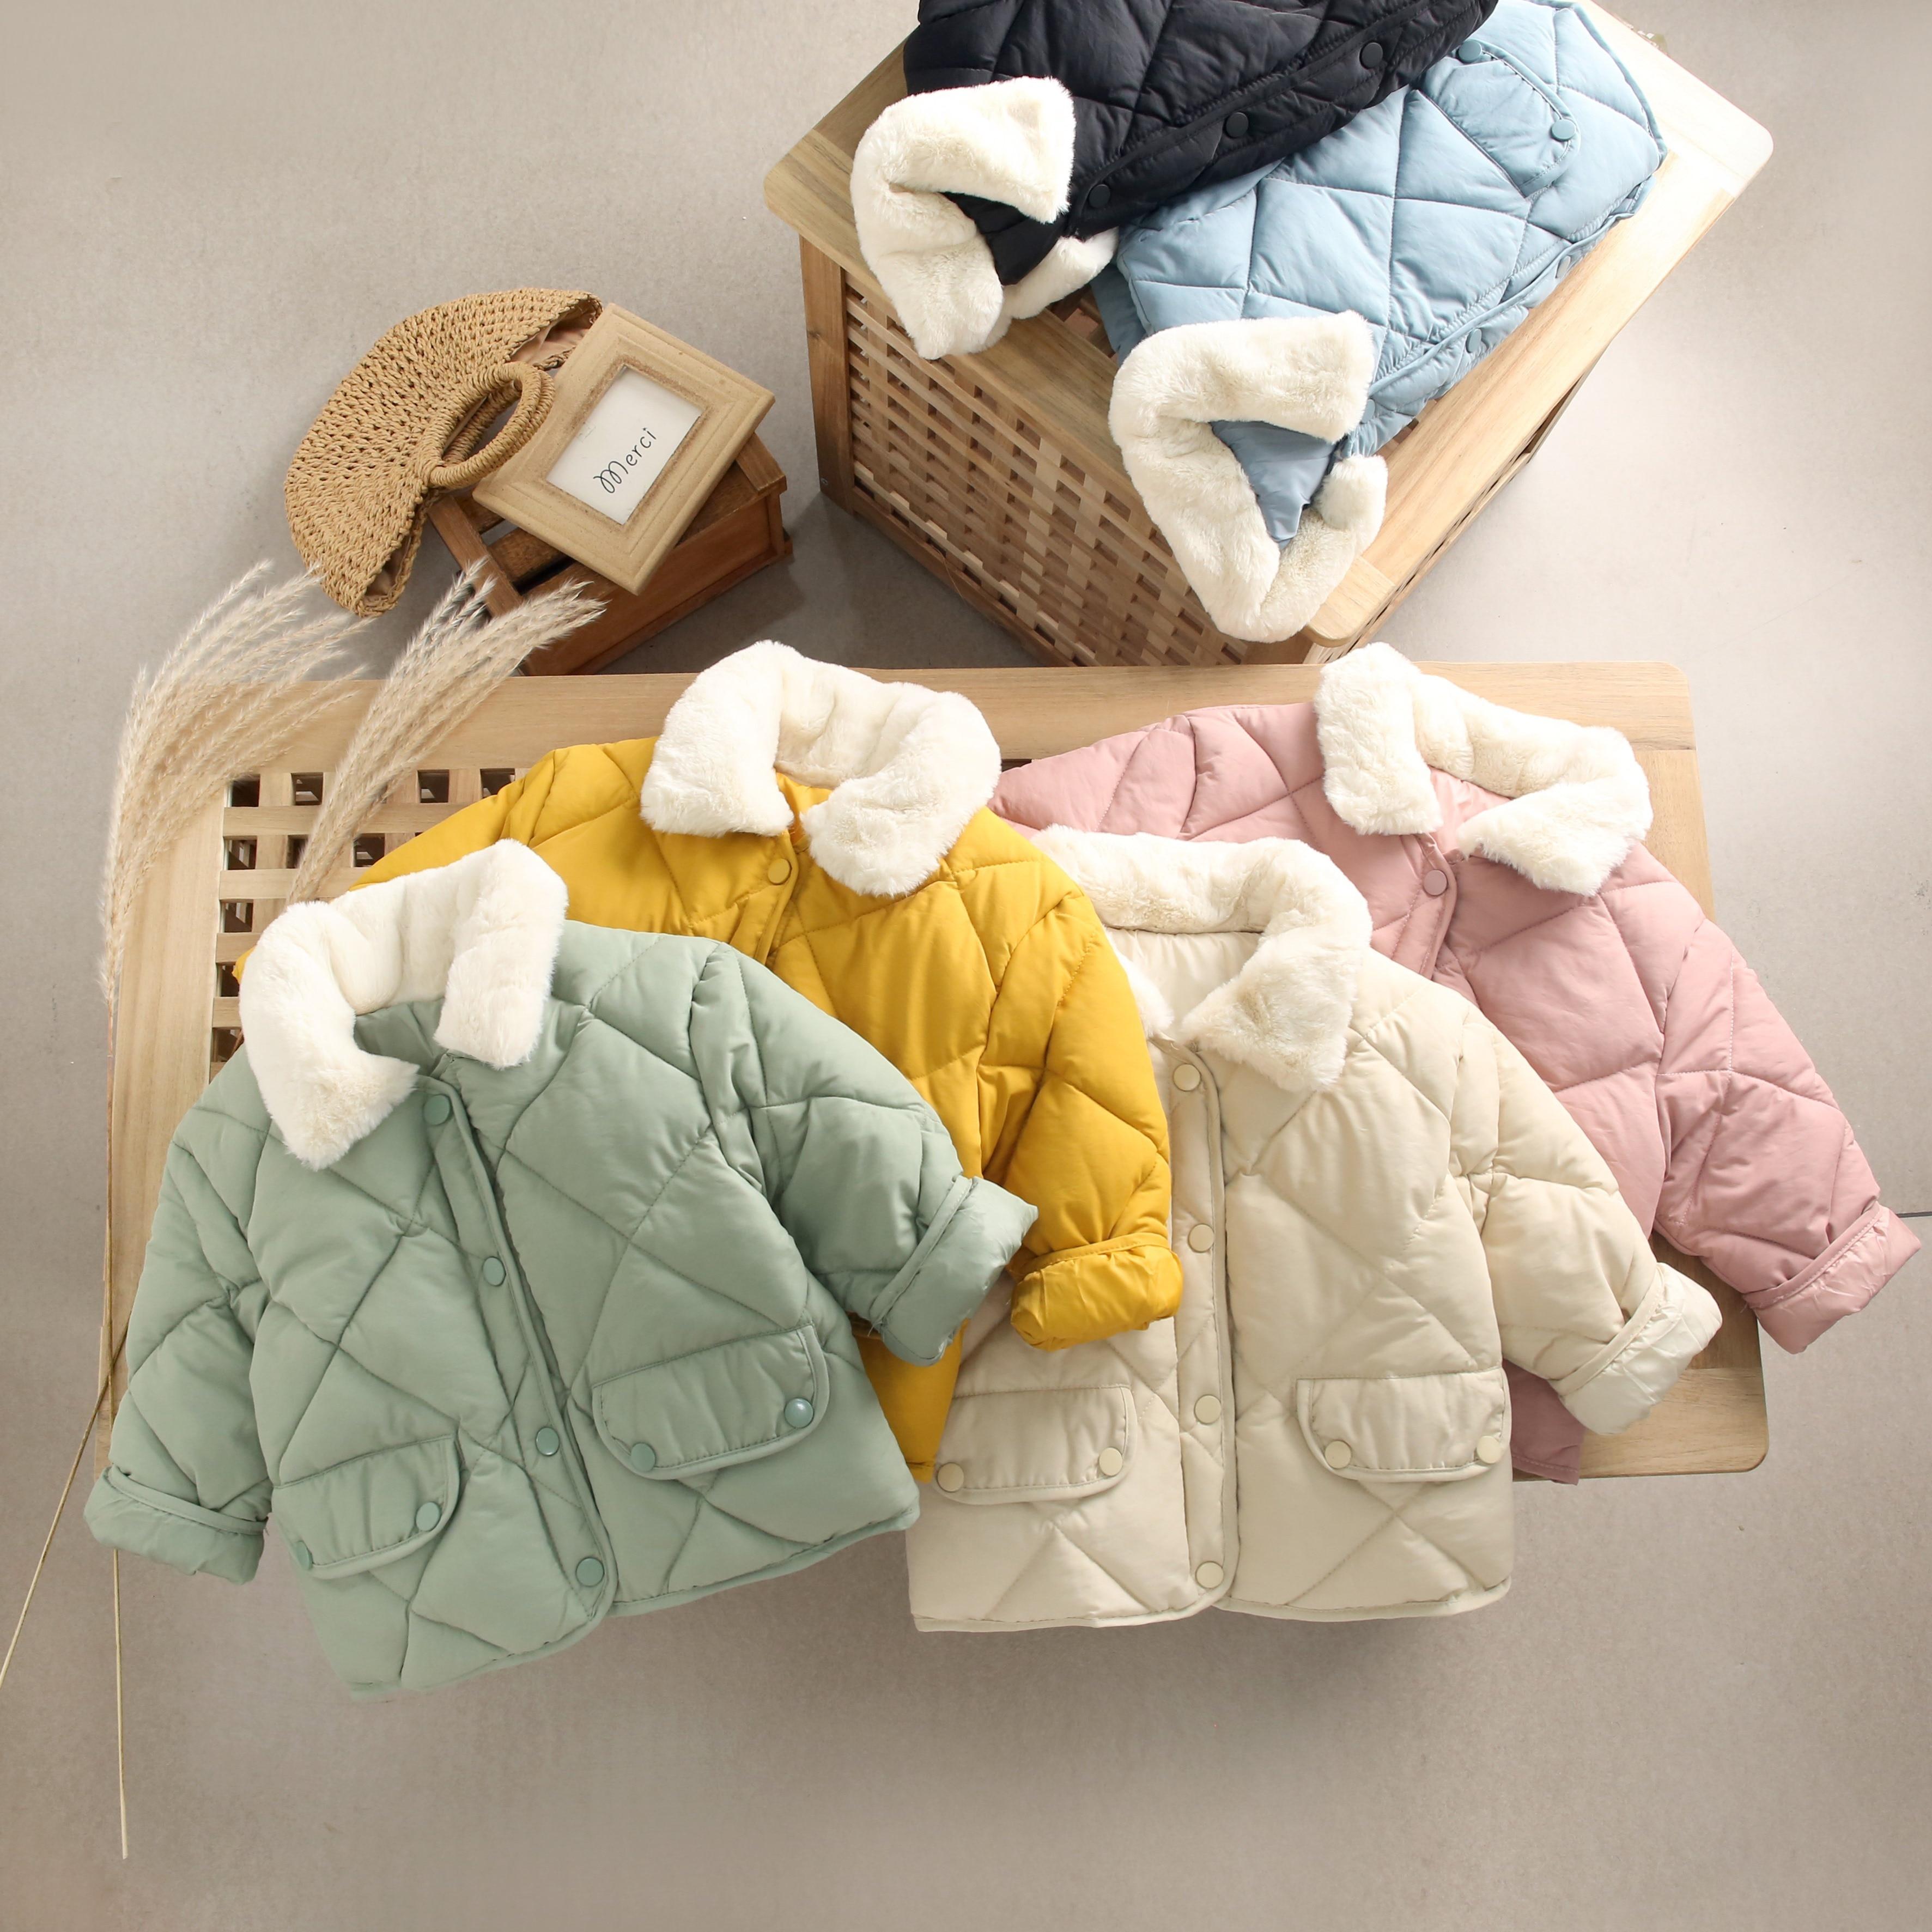 AliExpress - 2021 New Winter Children's Warm Cotton Jackets Girls Clothes Kids&Babys Rabbit Fur Collar Coats Korean Style For Boys Outerwears